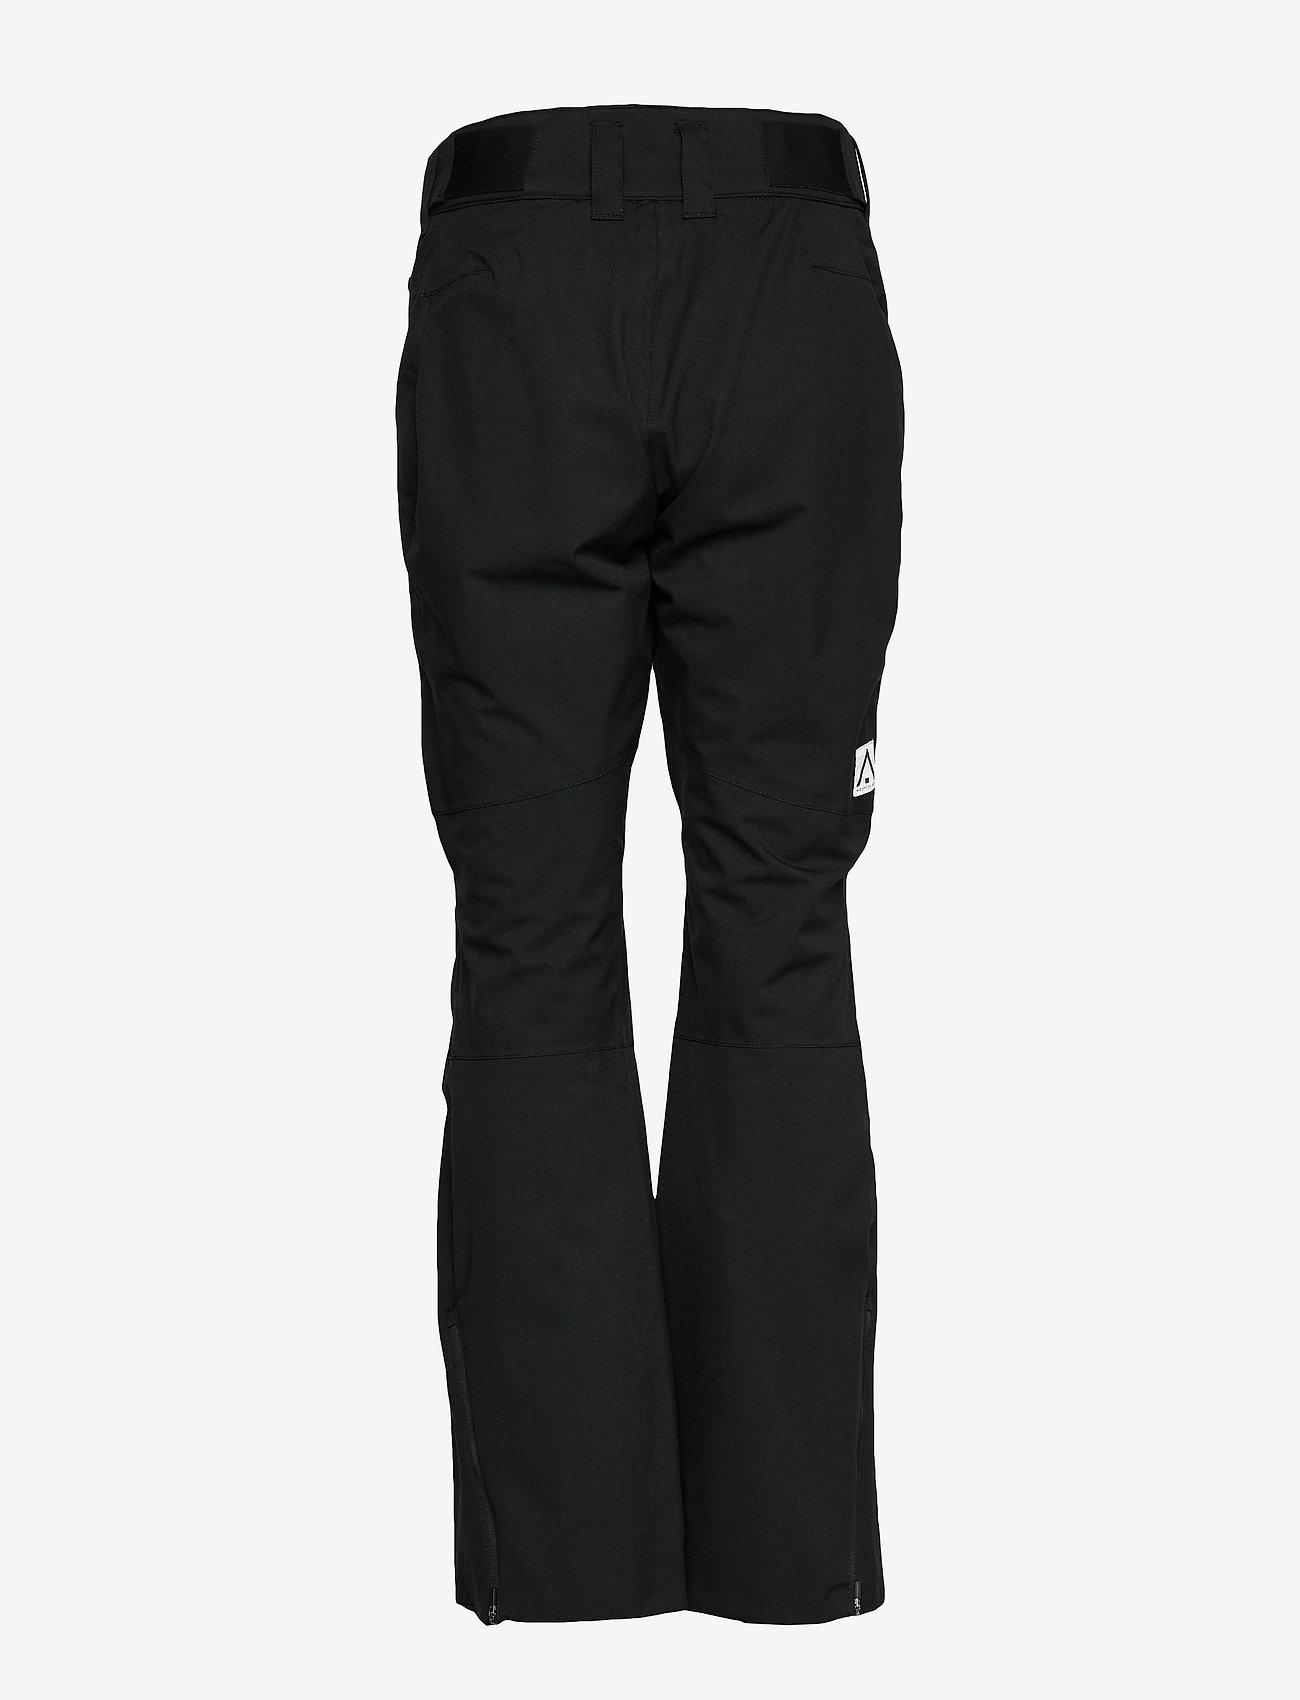 WearColour - BLAZE Pant - skibukser - black - 1